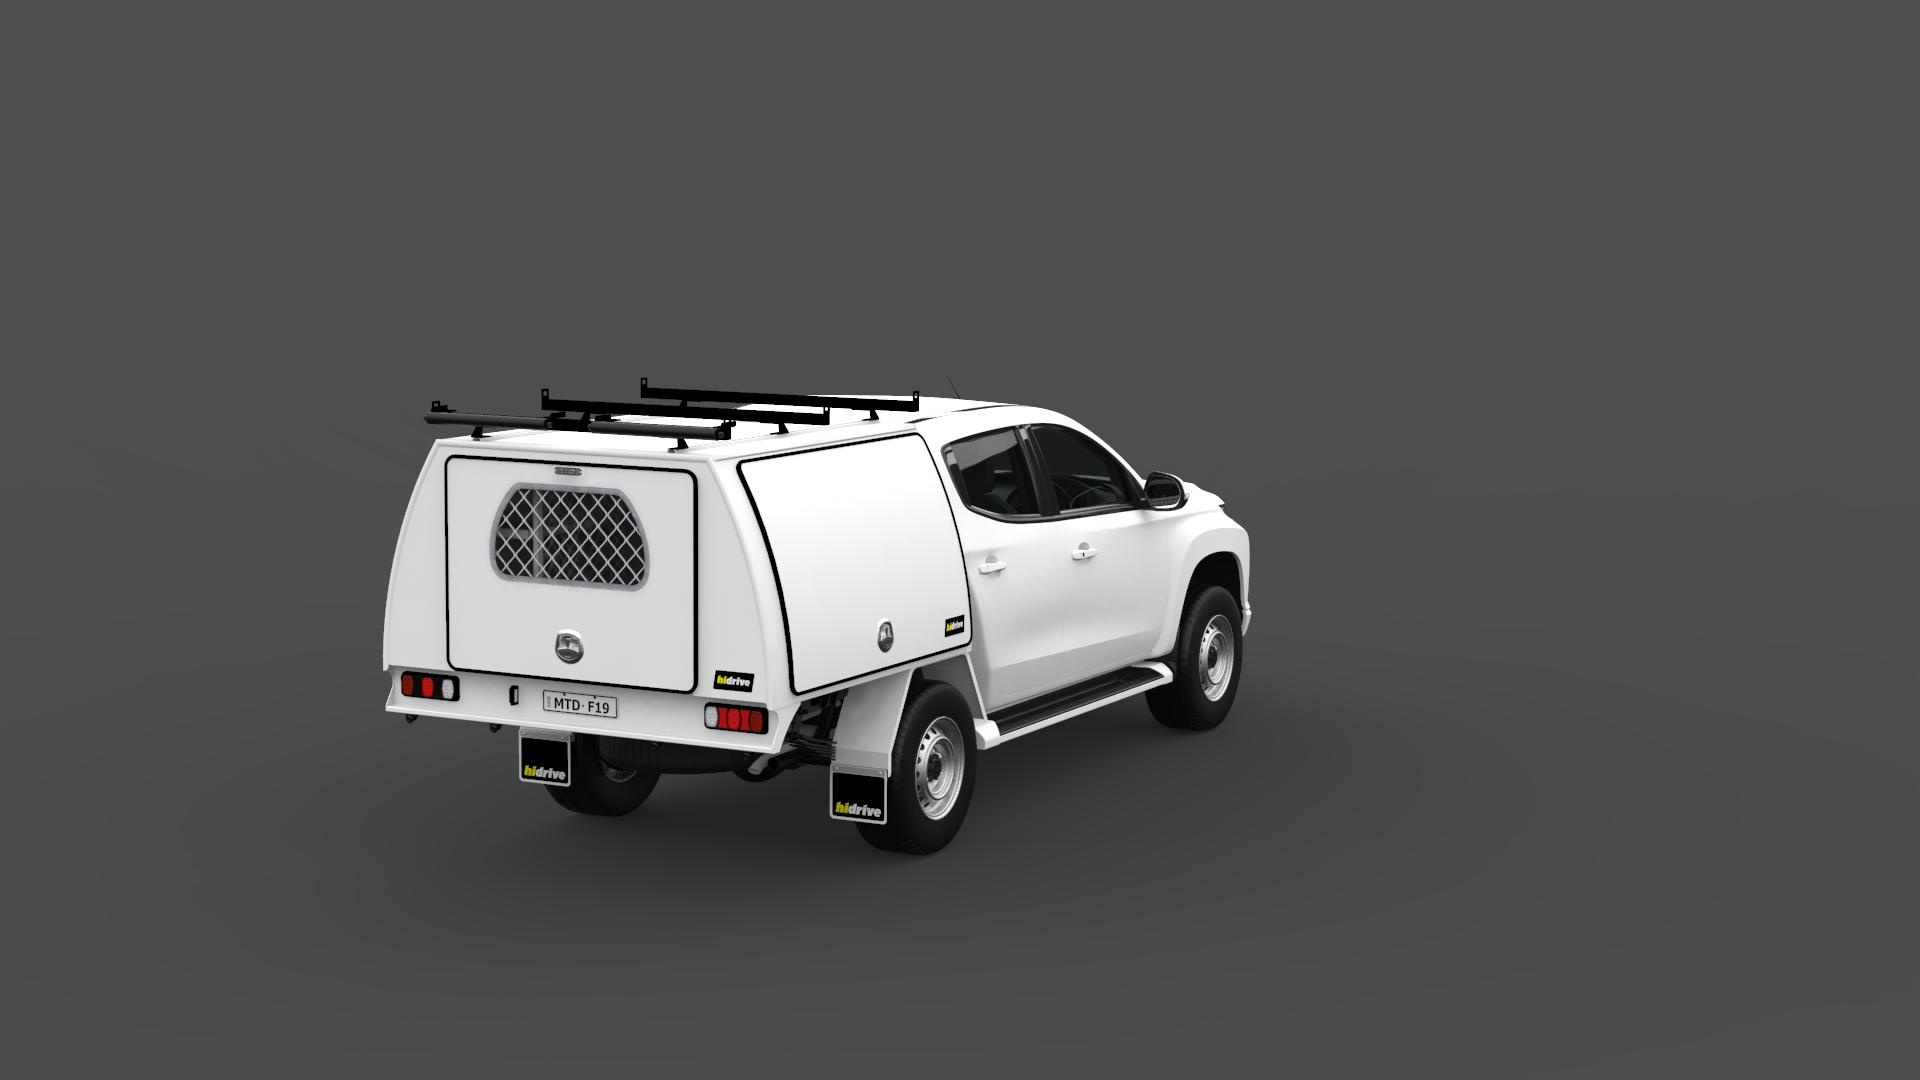 Mitsubishi Triton Double Cab Full Canopy